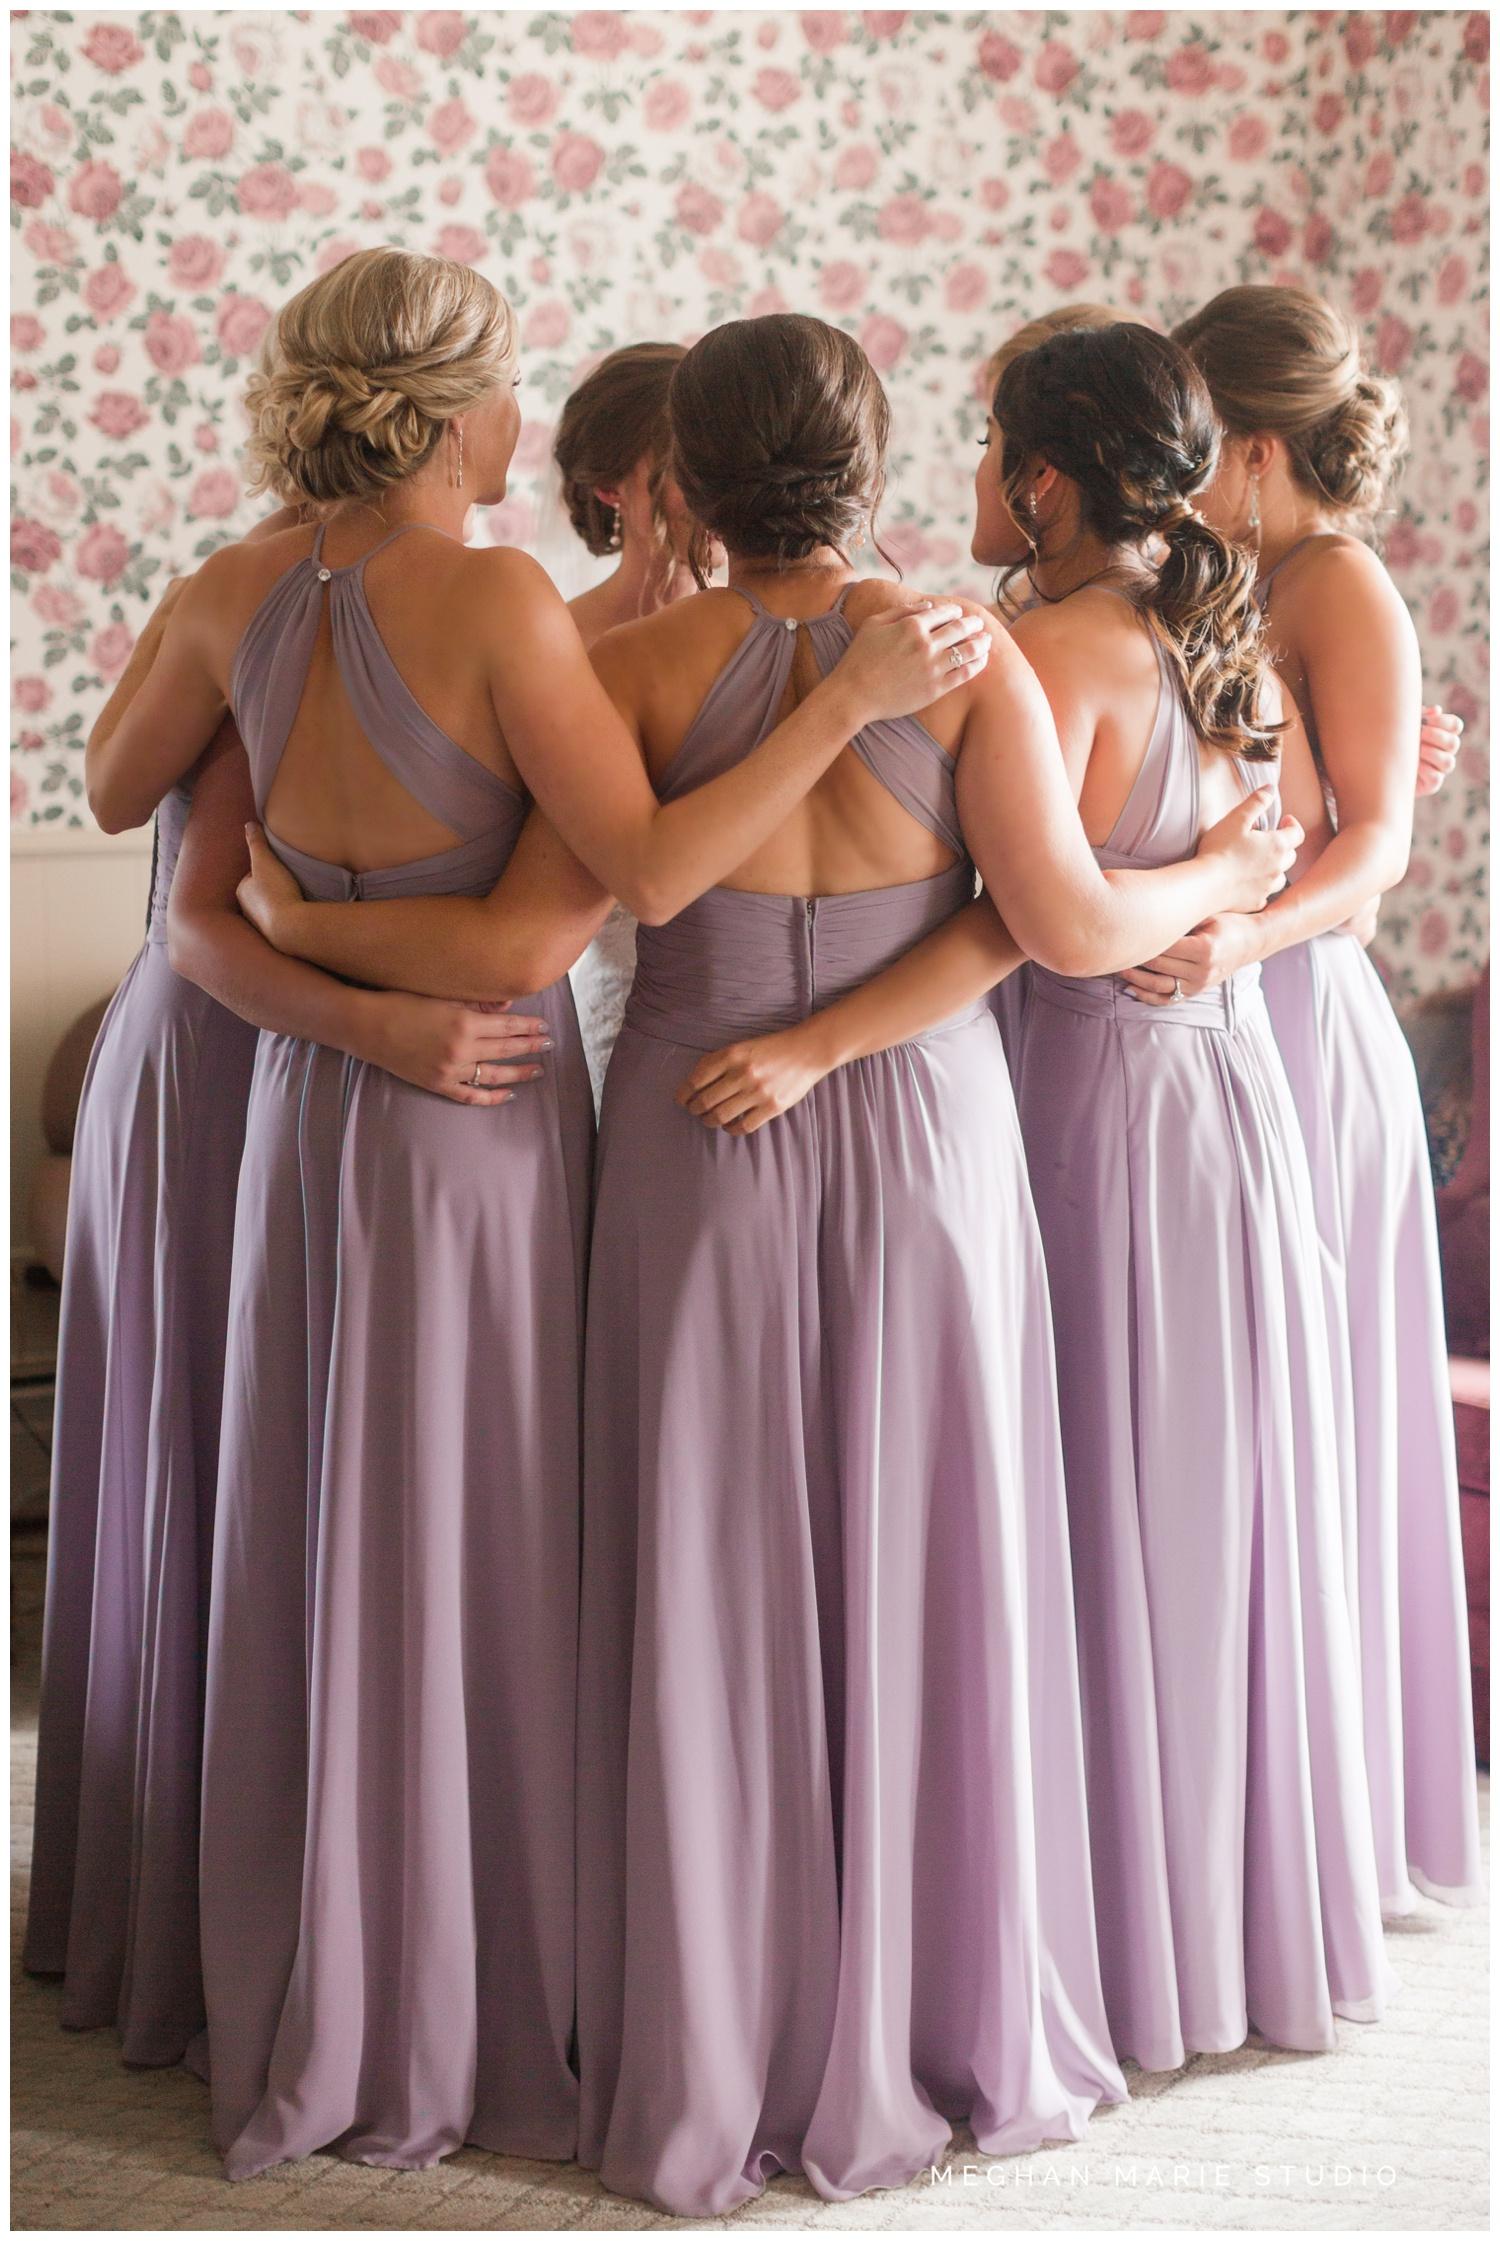 meghan marie studio wedding photographer ohio dayton cincinnati columbus minster st augustine dusty purple rose interracial couple romers catering_0702.jpg